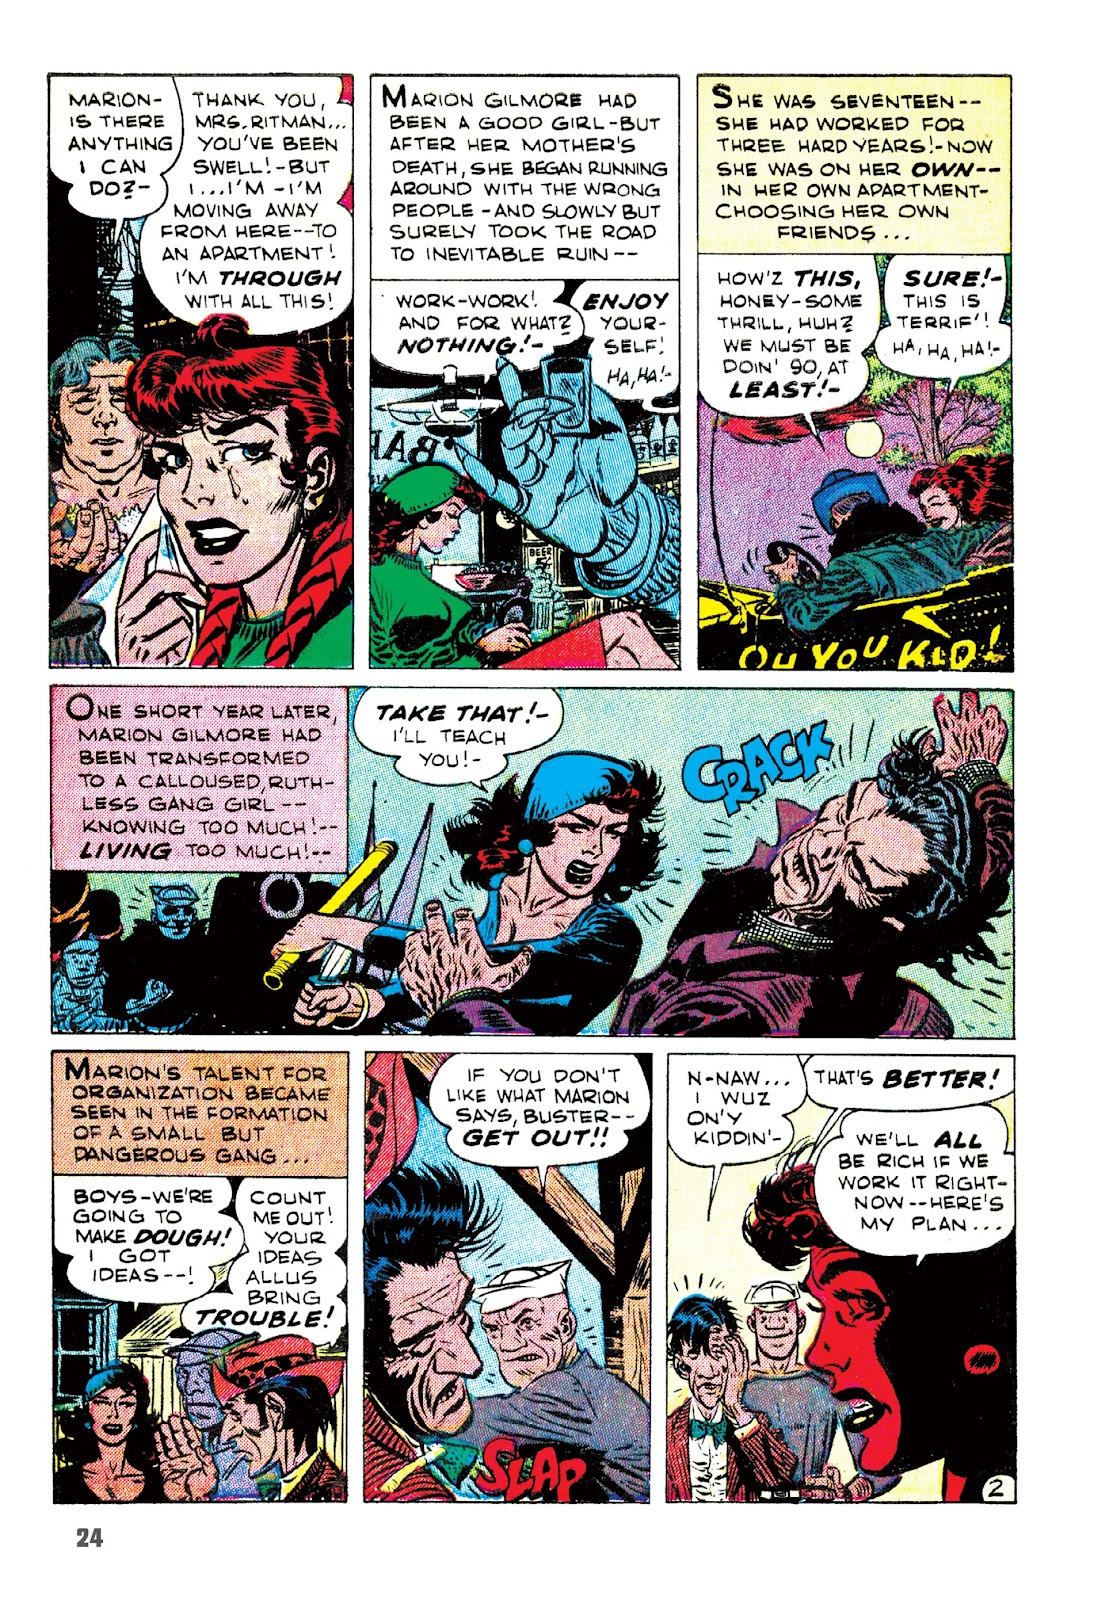 Read online The Joe Kubert Archives comic -  Issue # TPB (Part 1) - 35